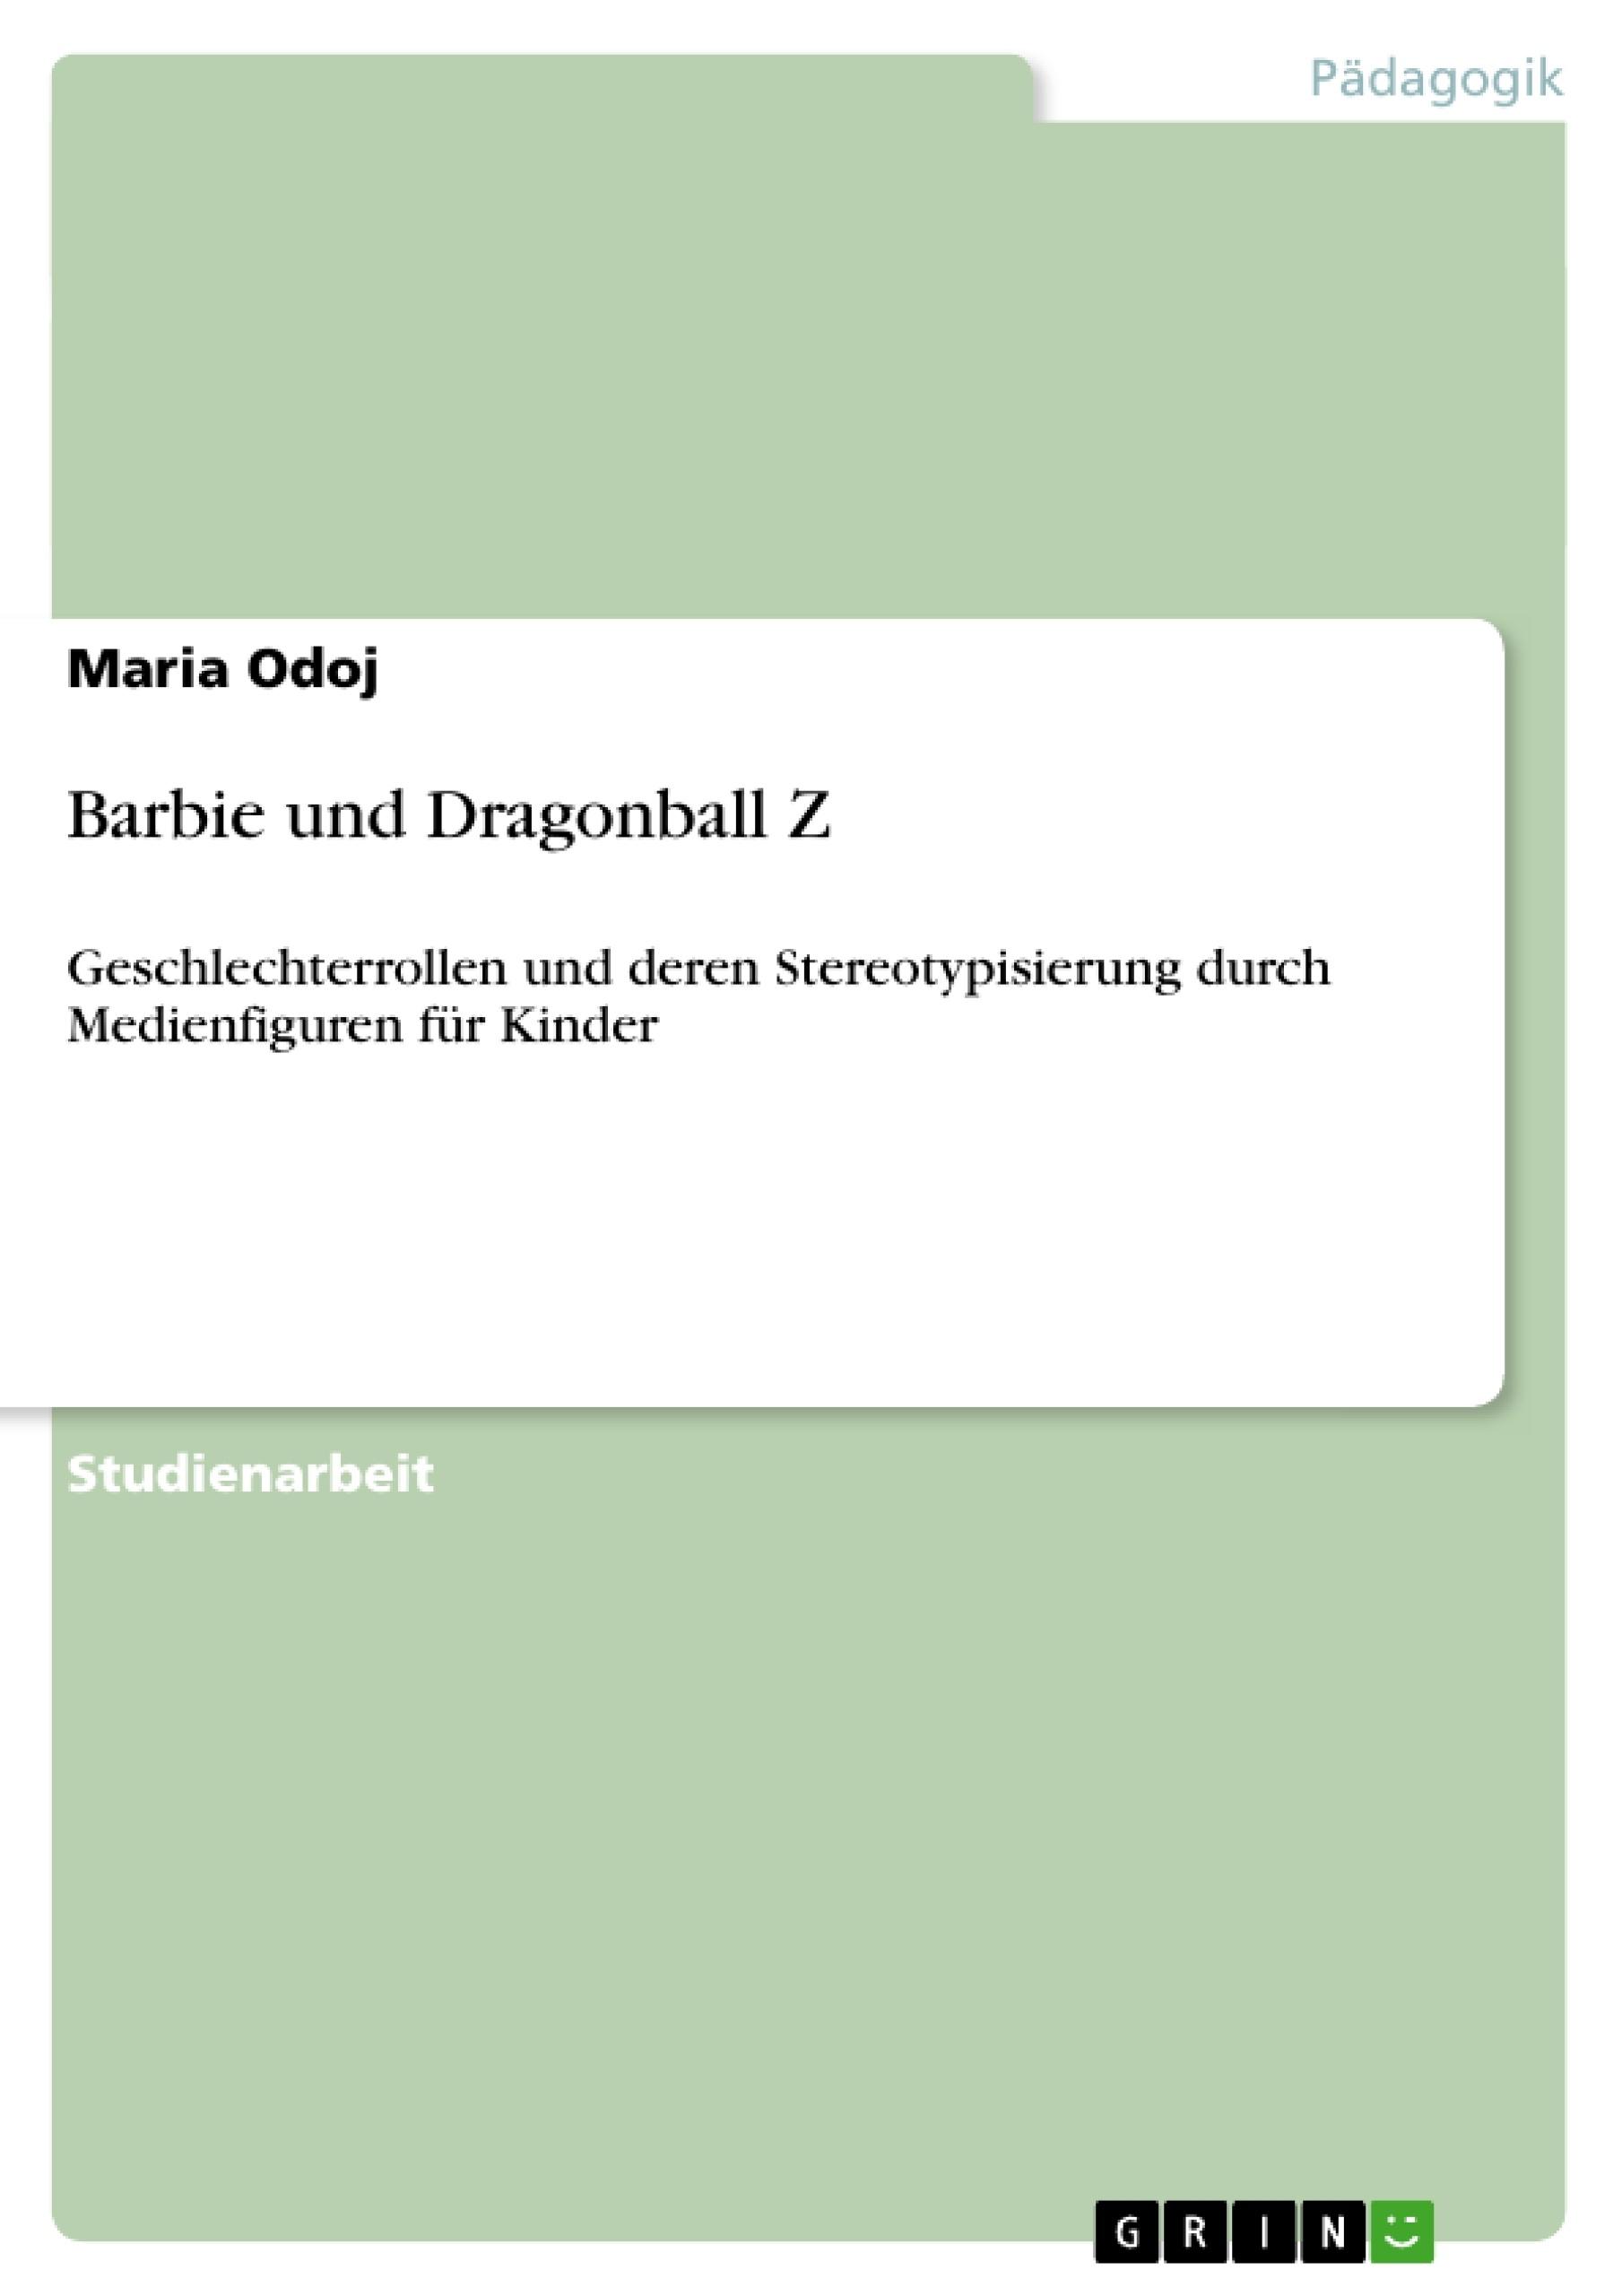 Titel: Barbie und Dragonball Z